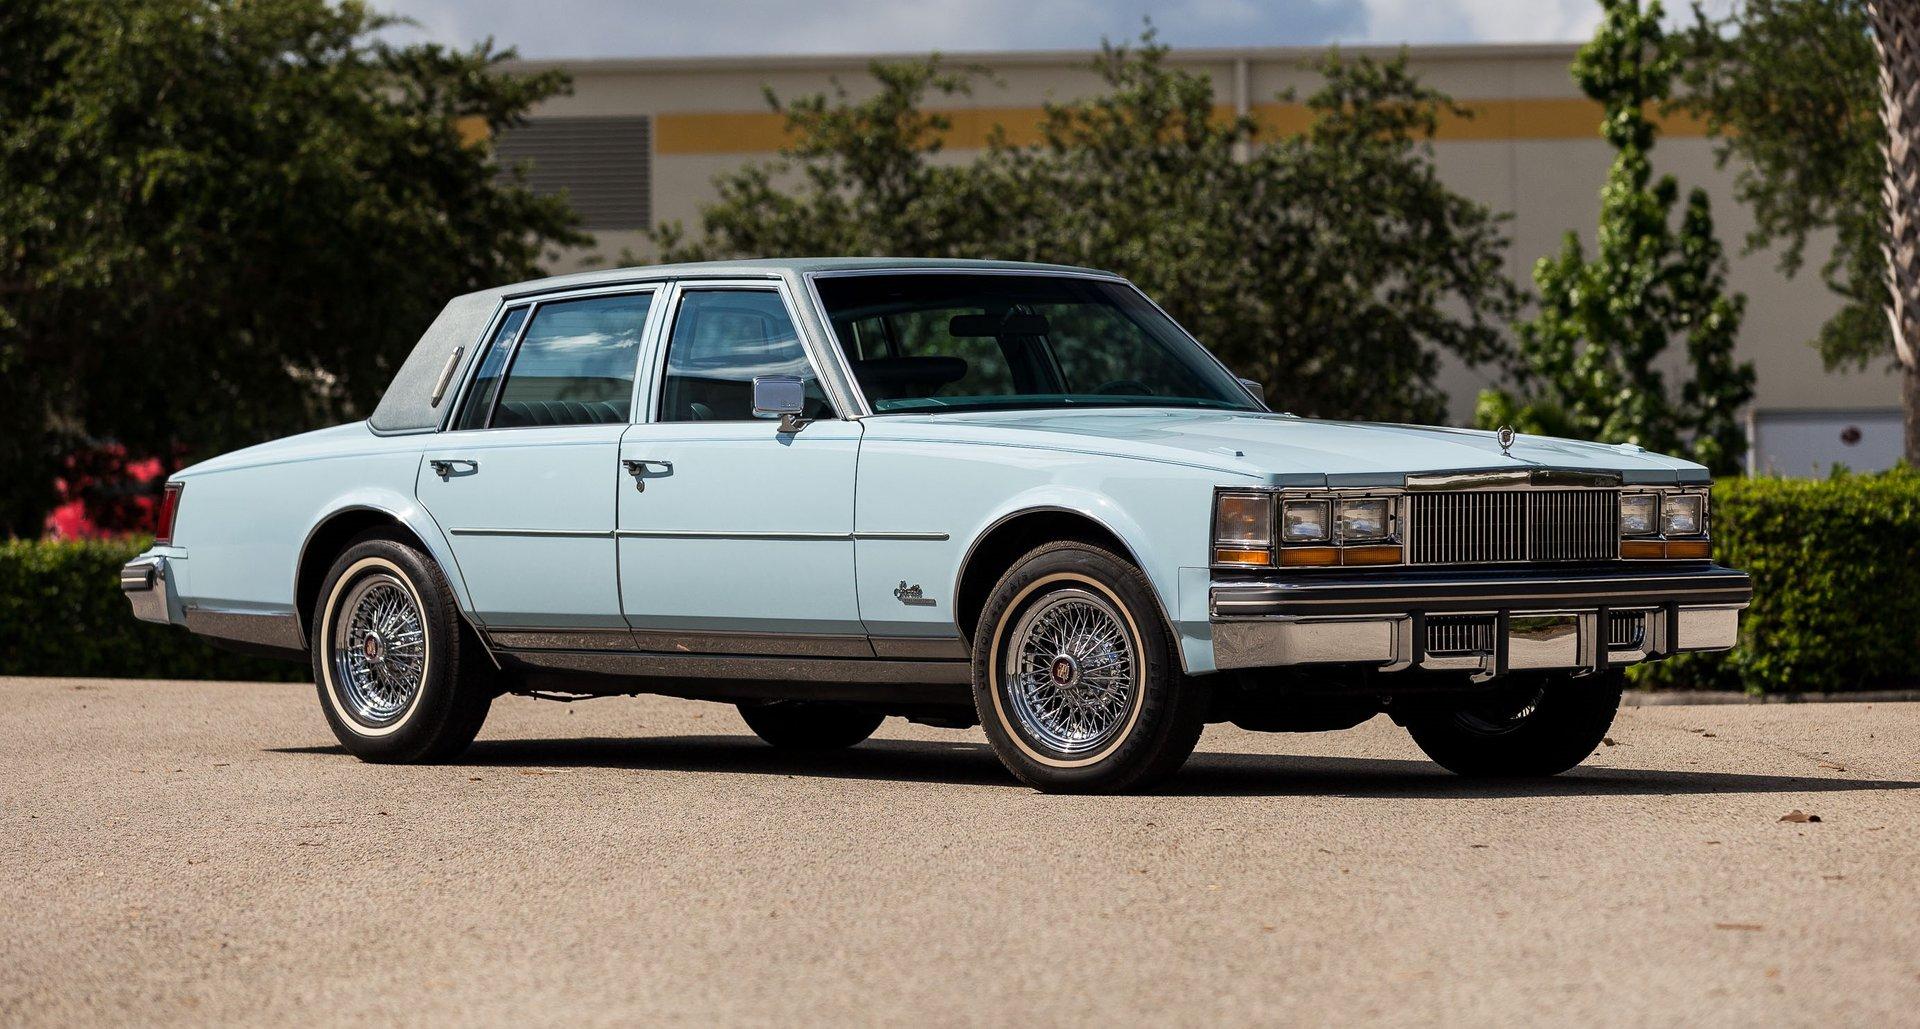 1978 Cadillac Seville